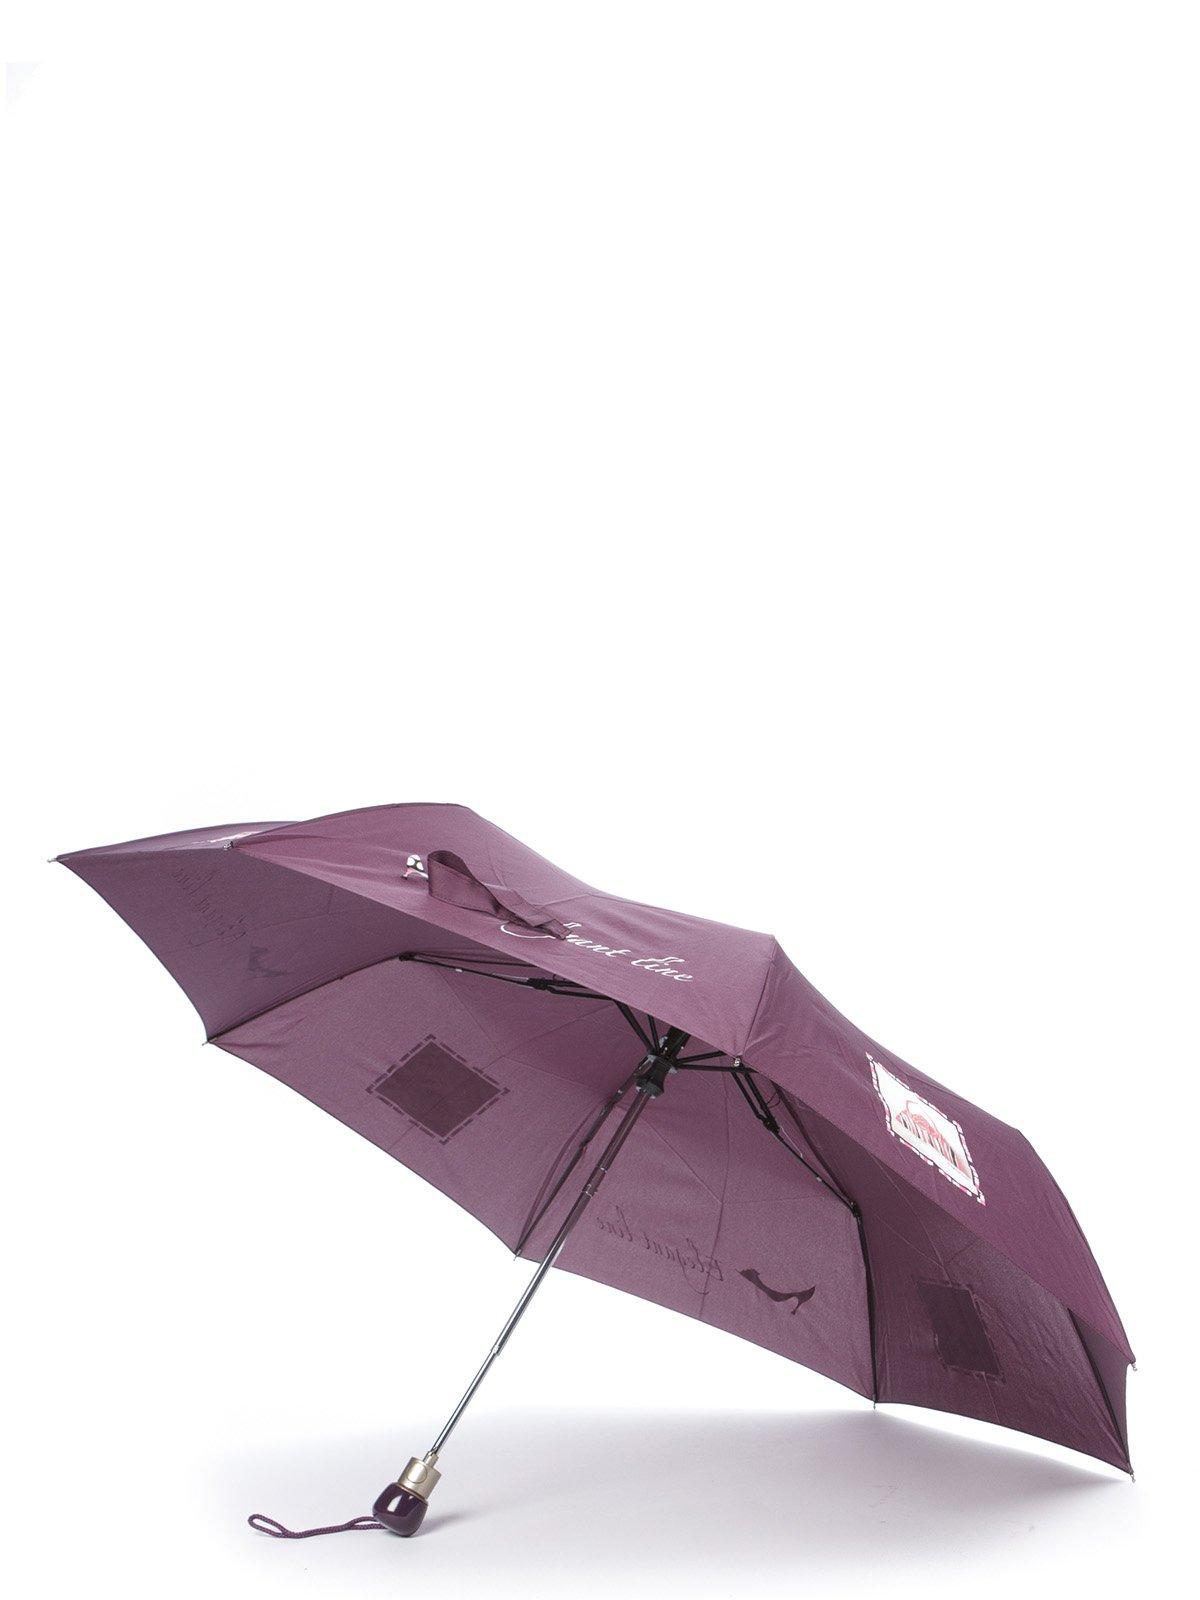 Зонт-полуавтомат | 1019531 | фото 2